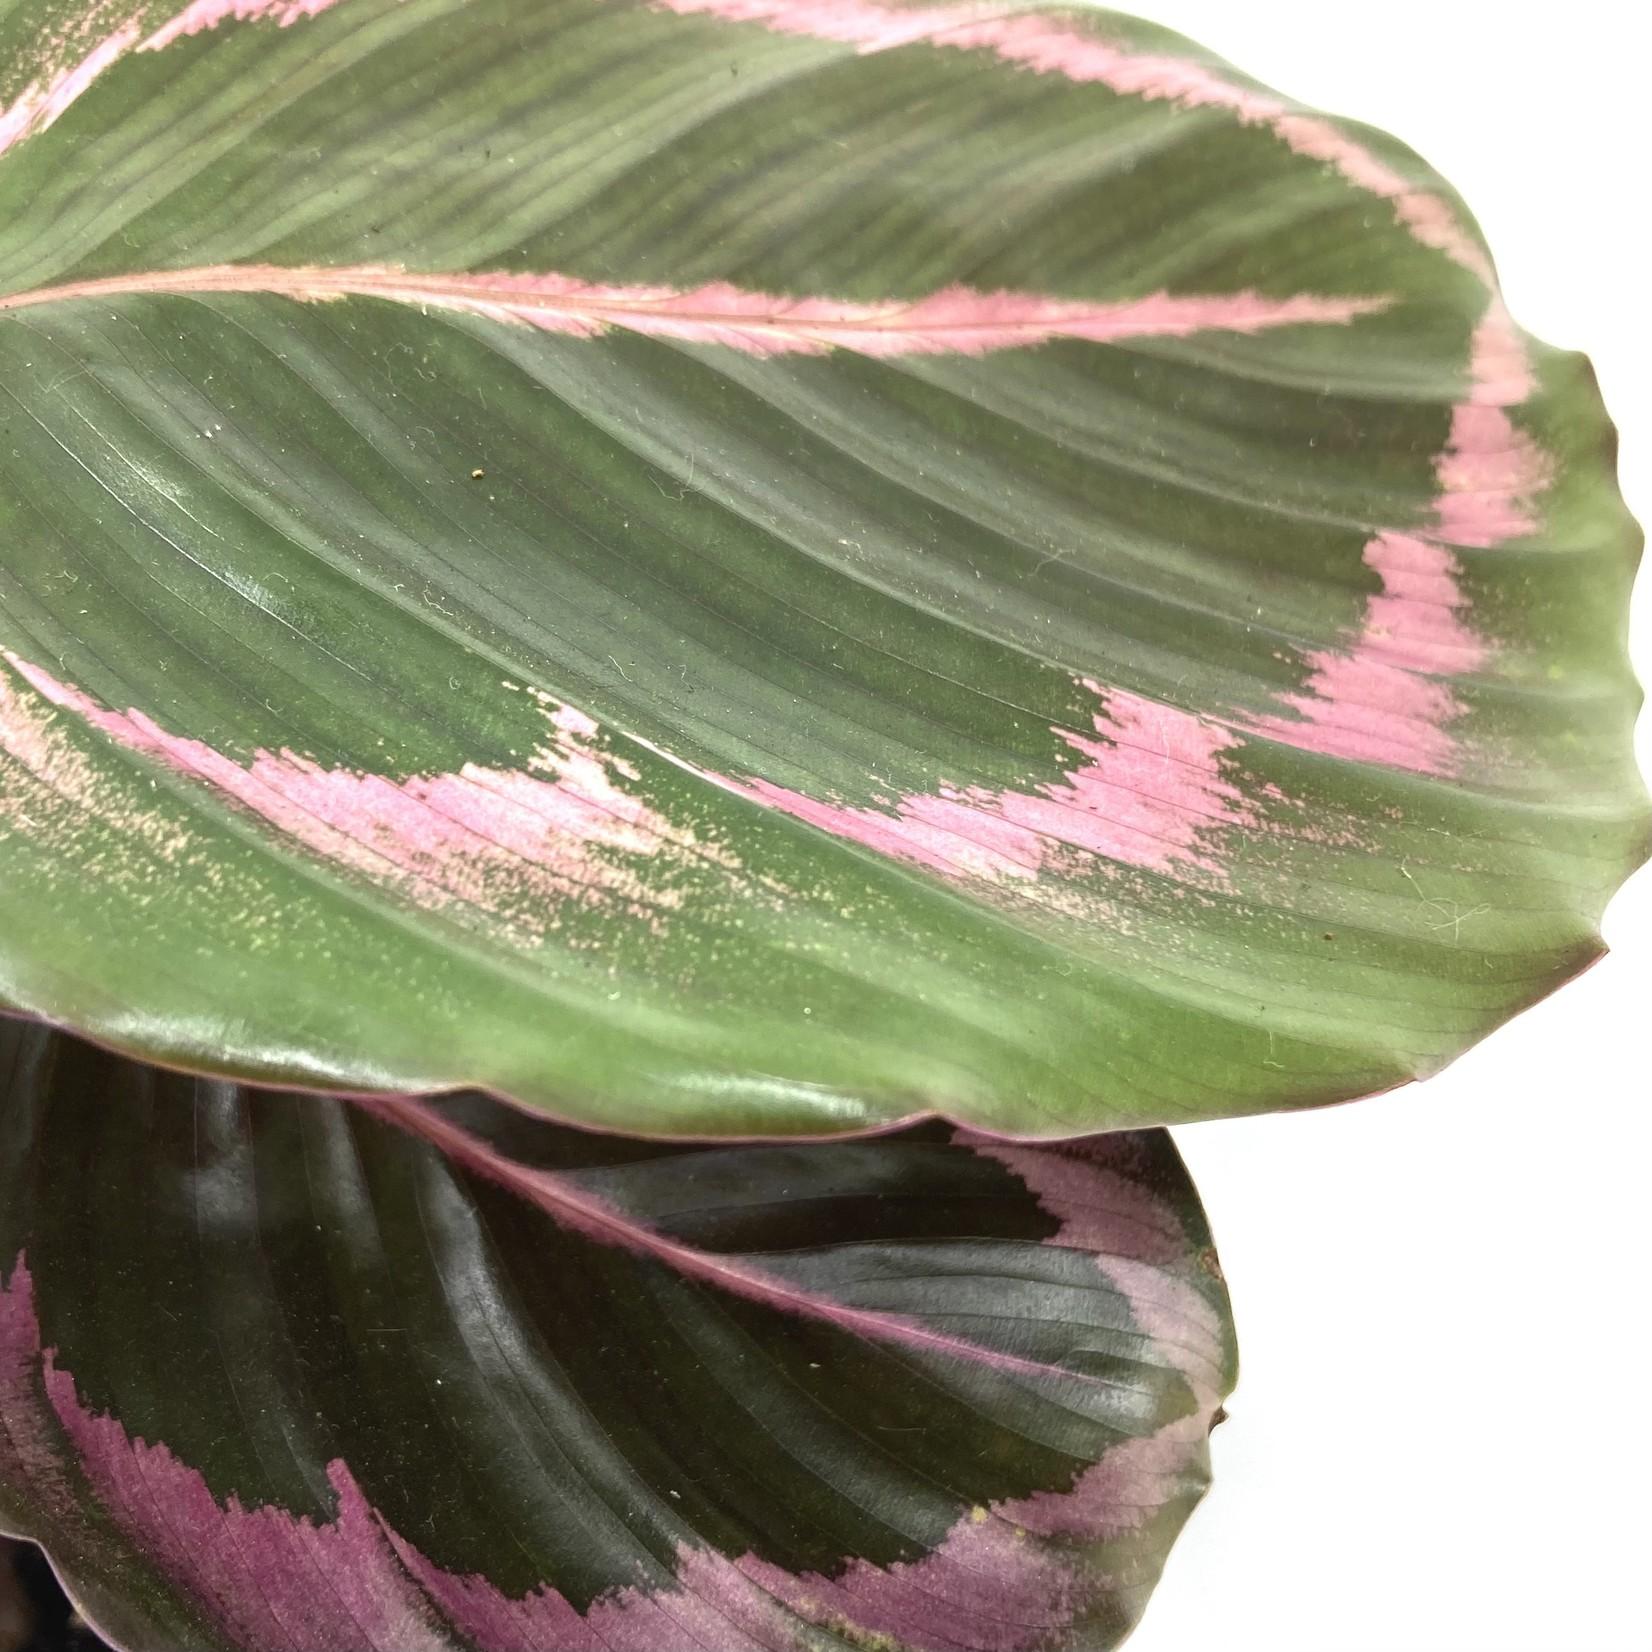 Calathea roseopicta 'Surprisestar'